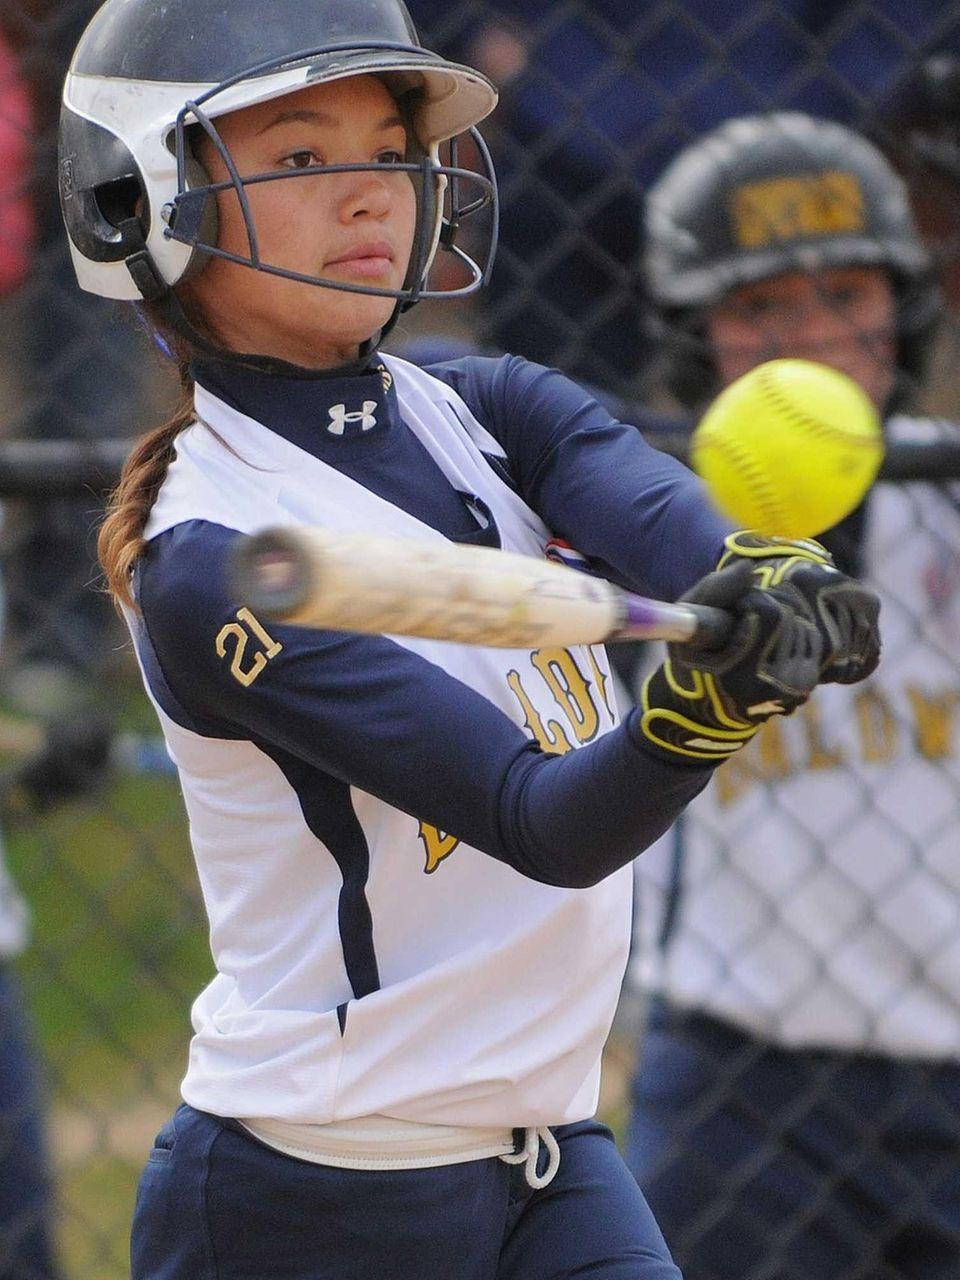 Baldwin shortstop Jade Aponte singles to start the